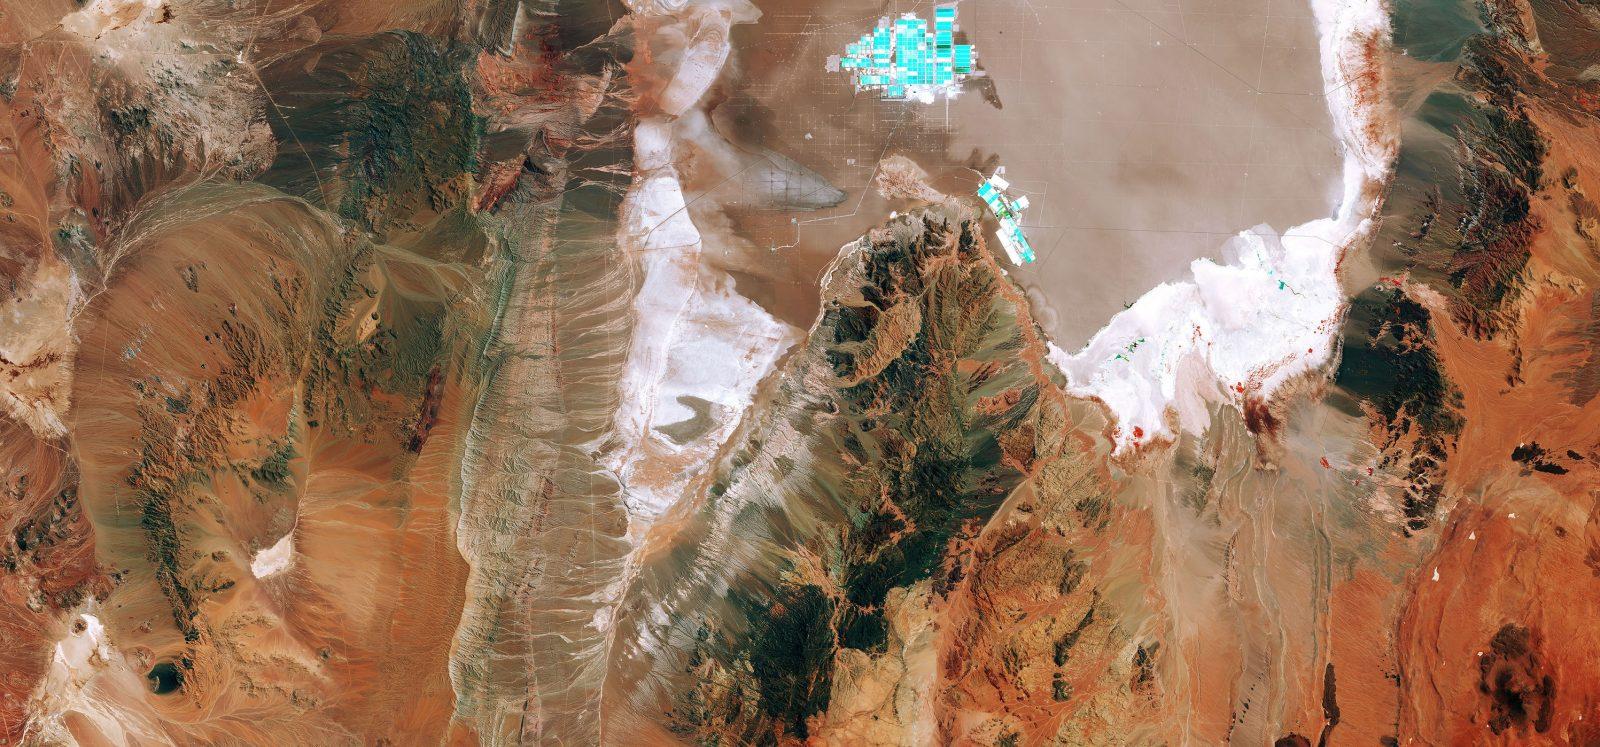 Chile's salt flat